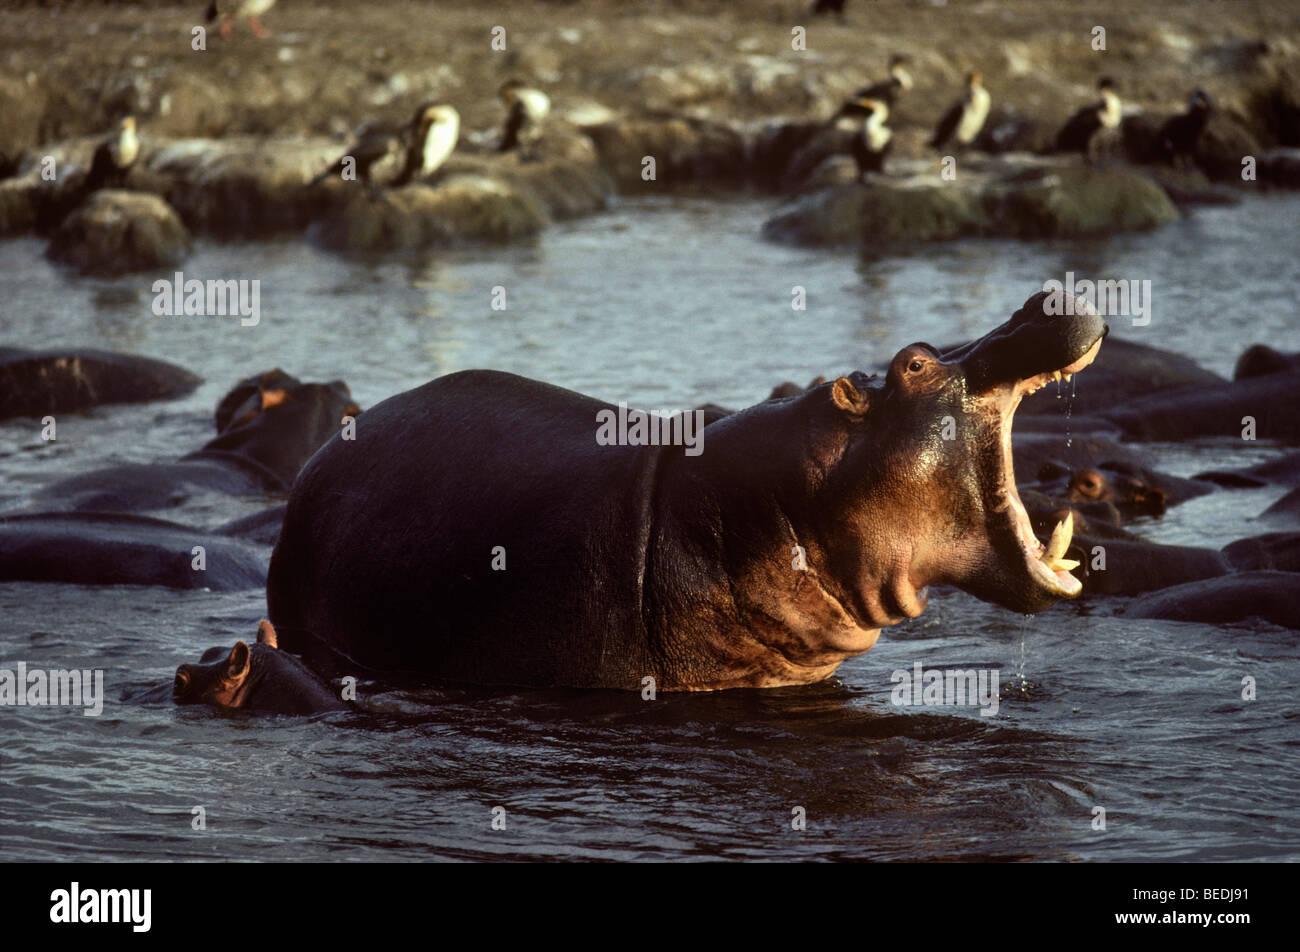 Hippos at Lake Manyara National Park, Tanzania. - Stock Image